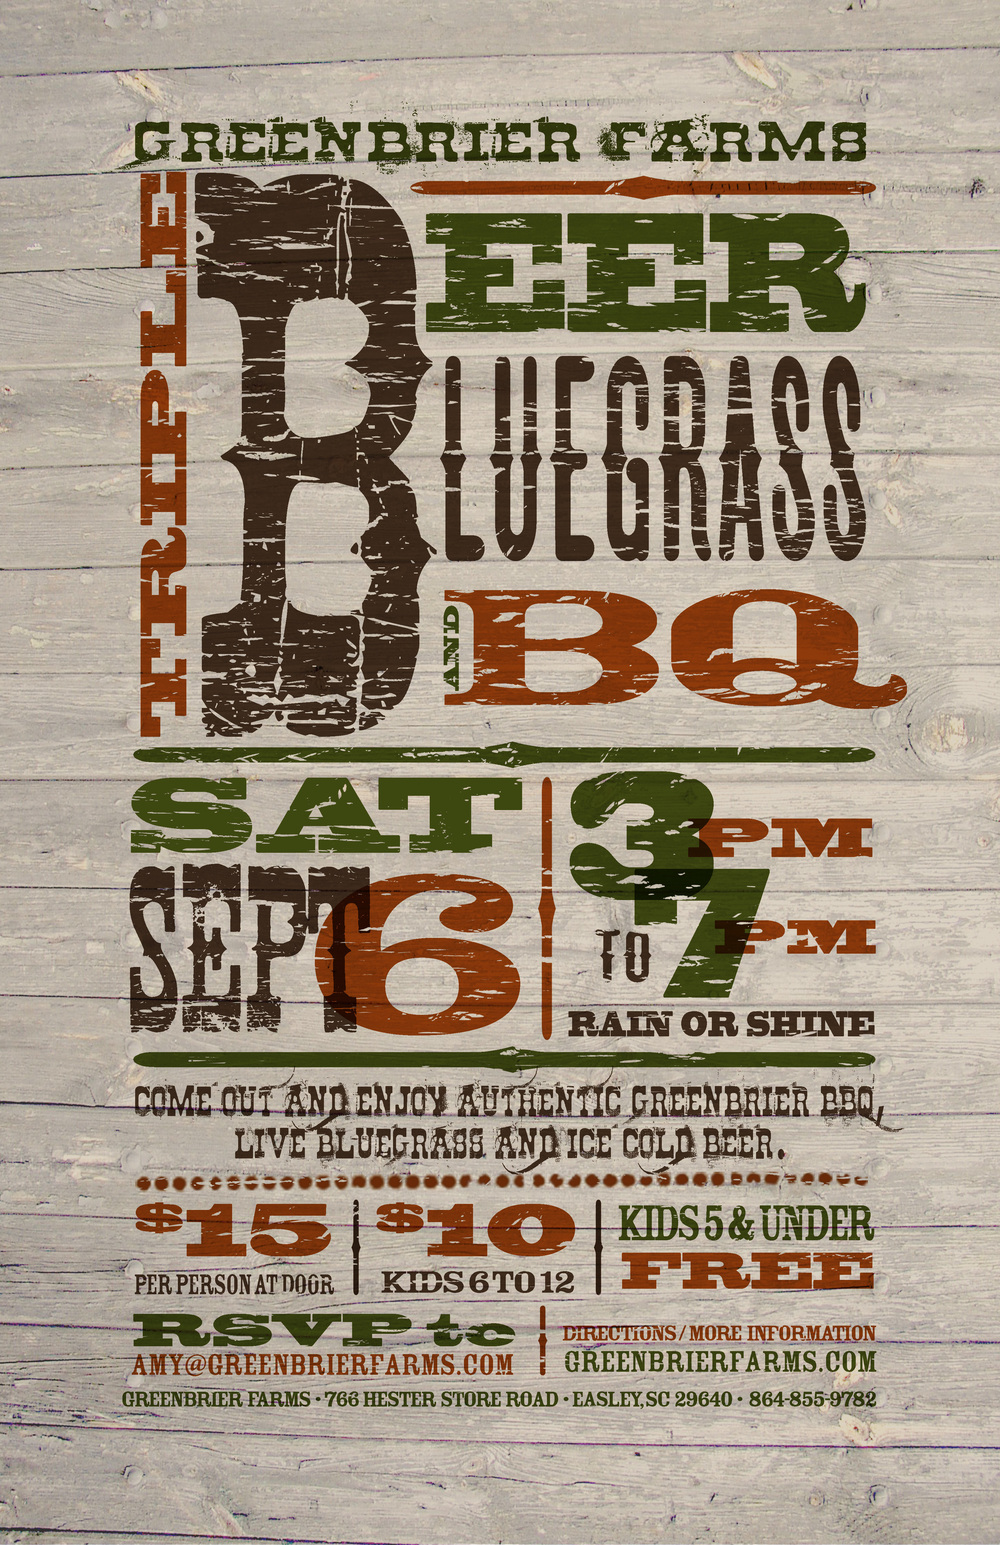 Greenbrier Farms 2014 Triple B Event Poster - Alternate